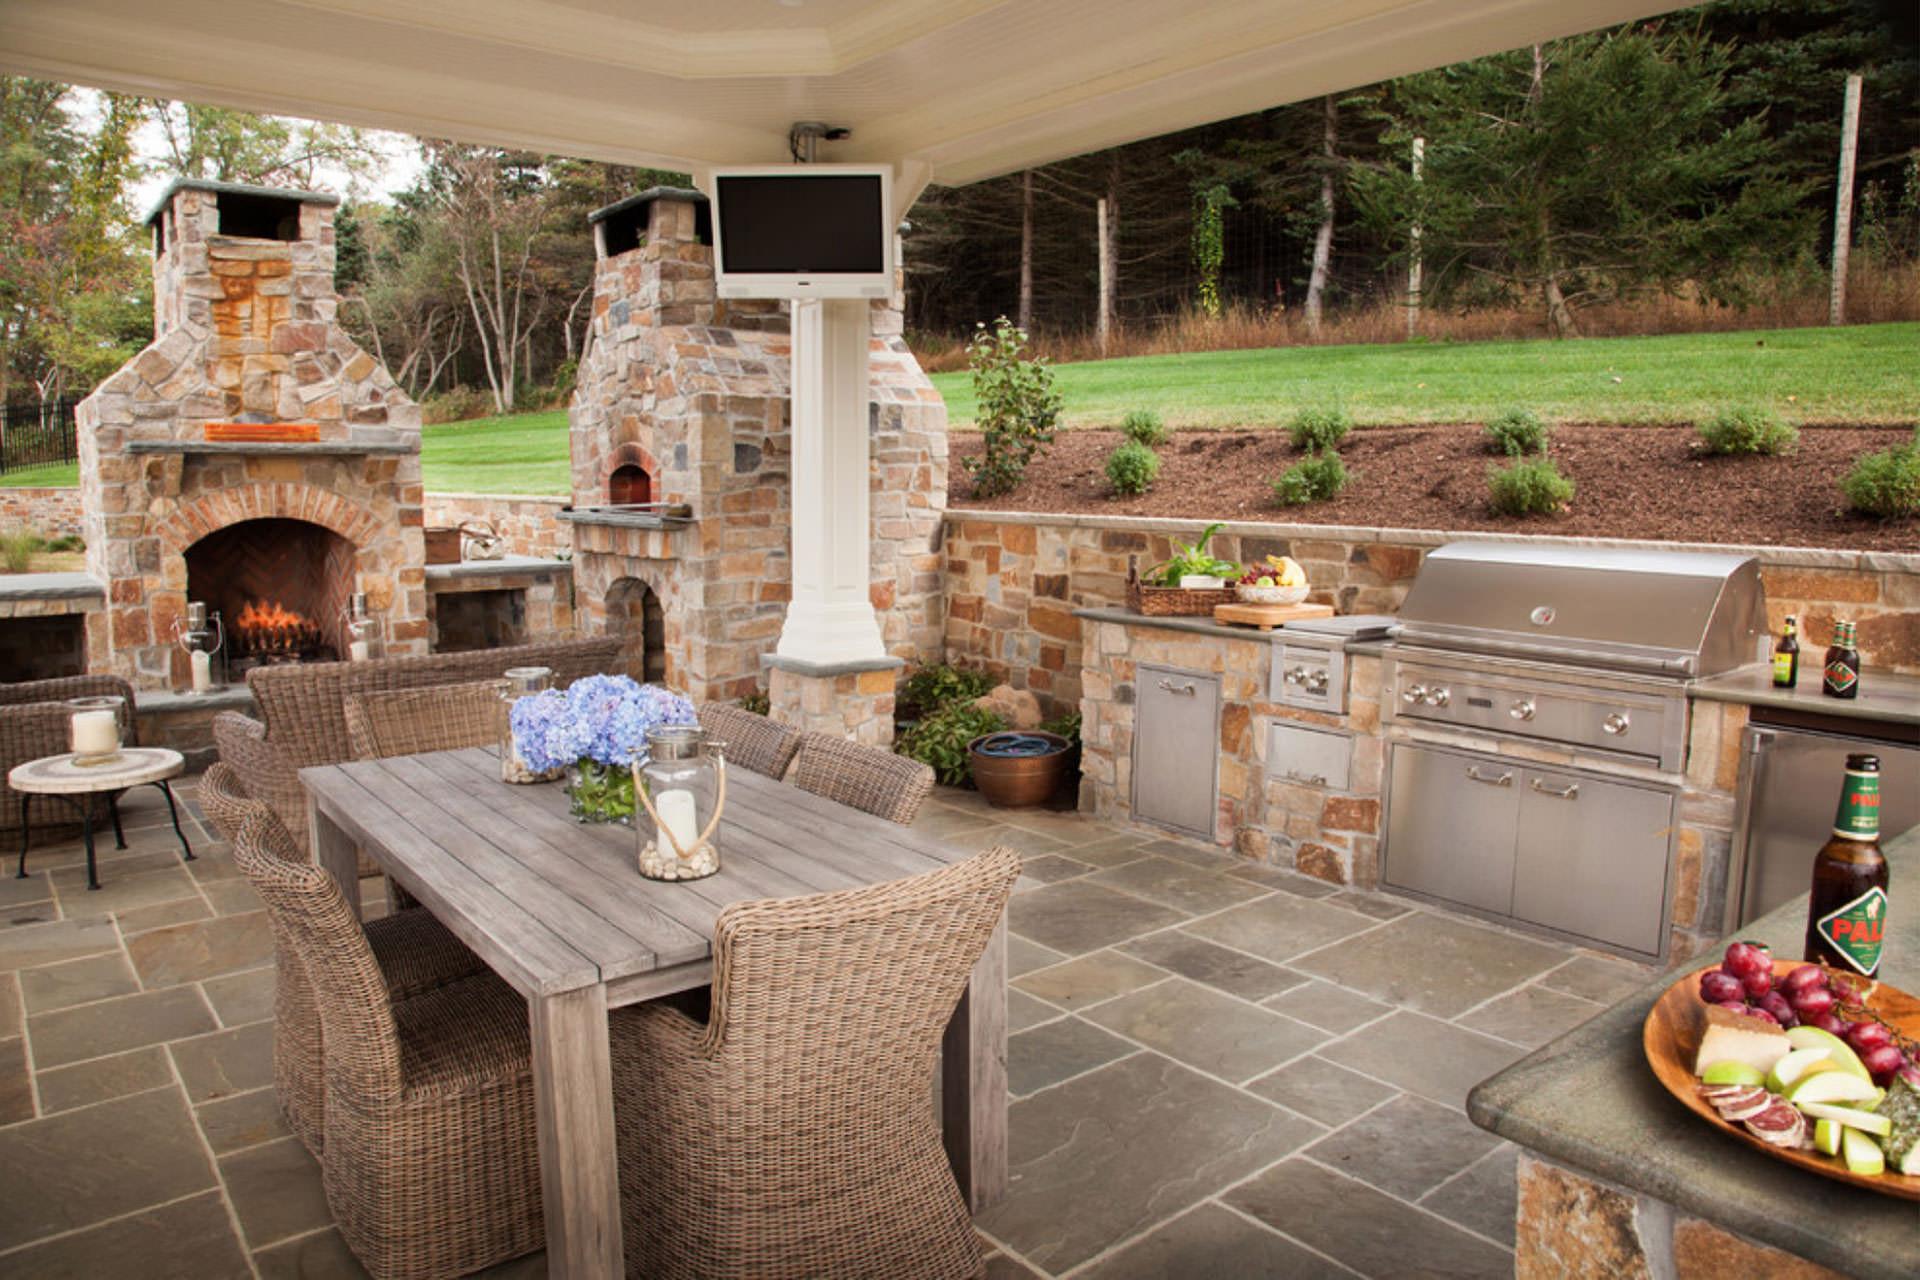 Outdoor Kitchen Designs  Five Popular Design Features for Outdoor Entertaining